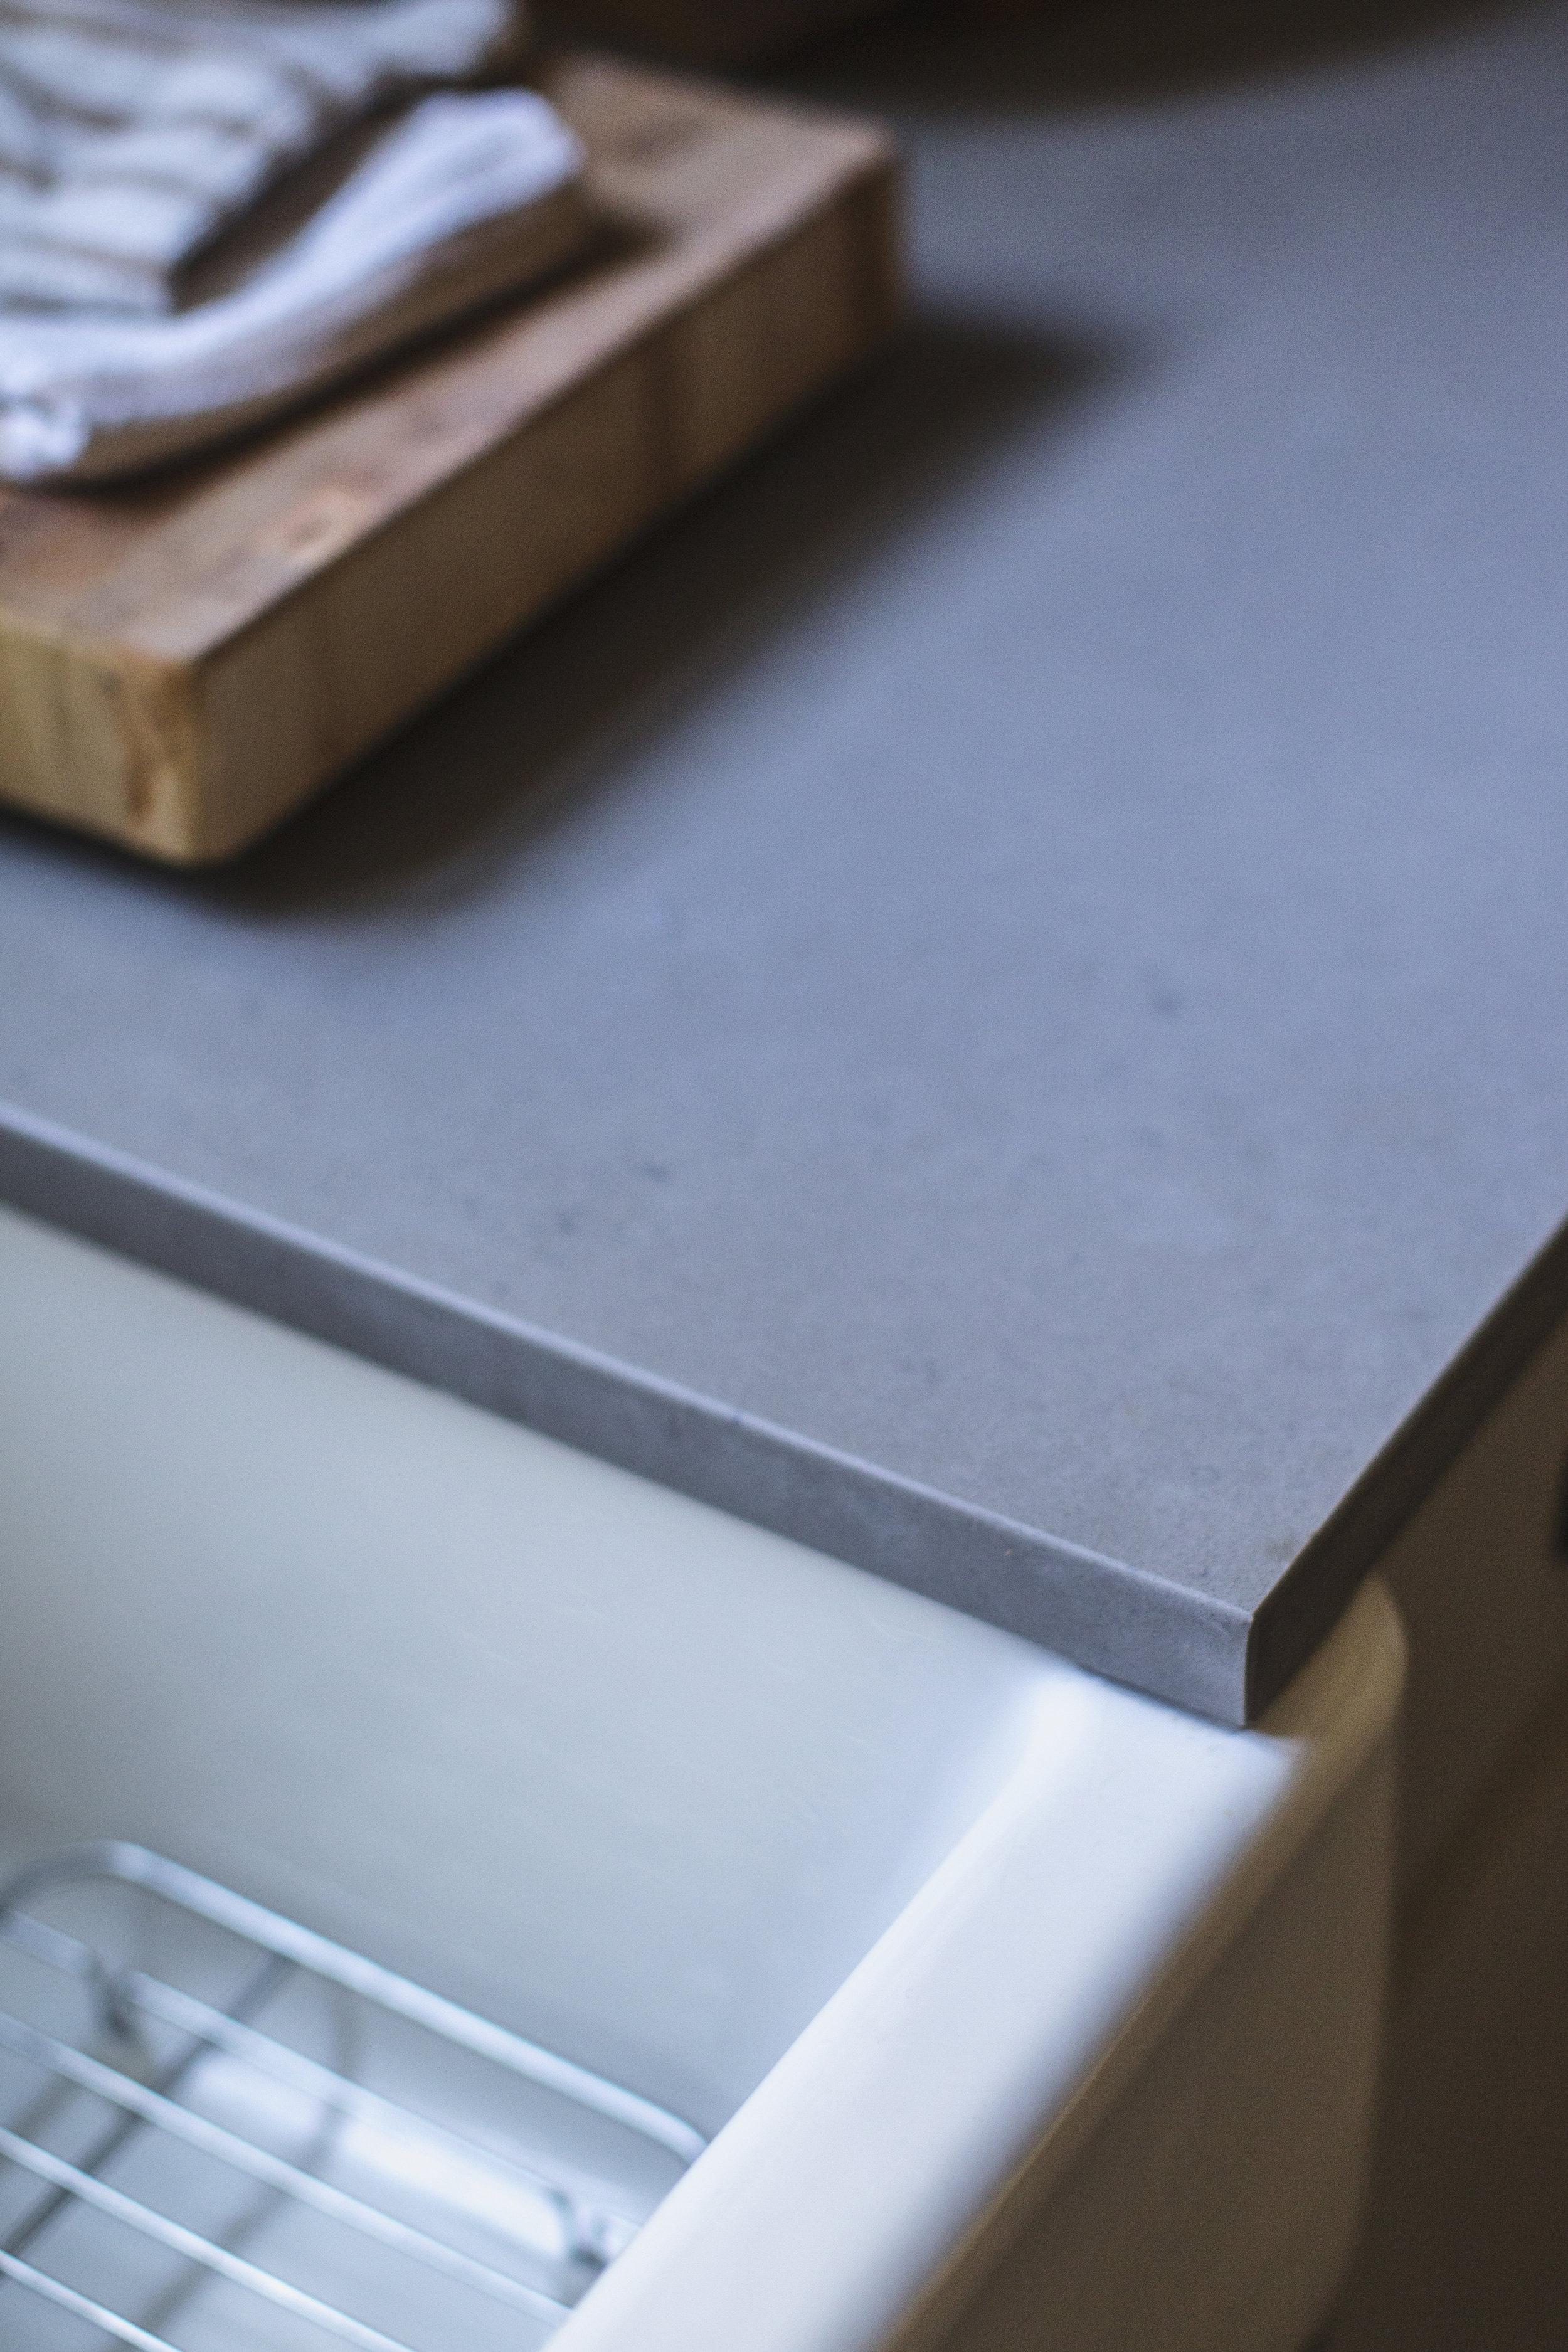 caesarstone quartz countertop in honed pebble / heirloomed